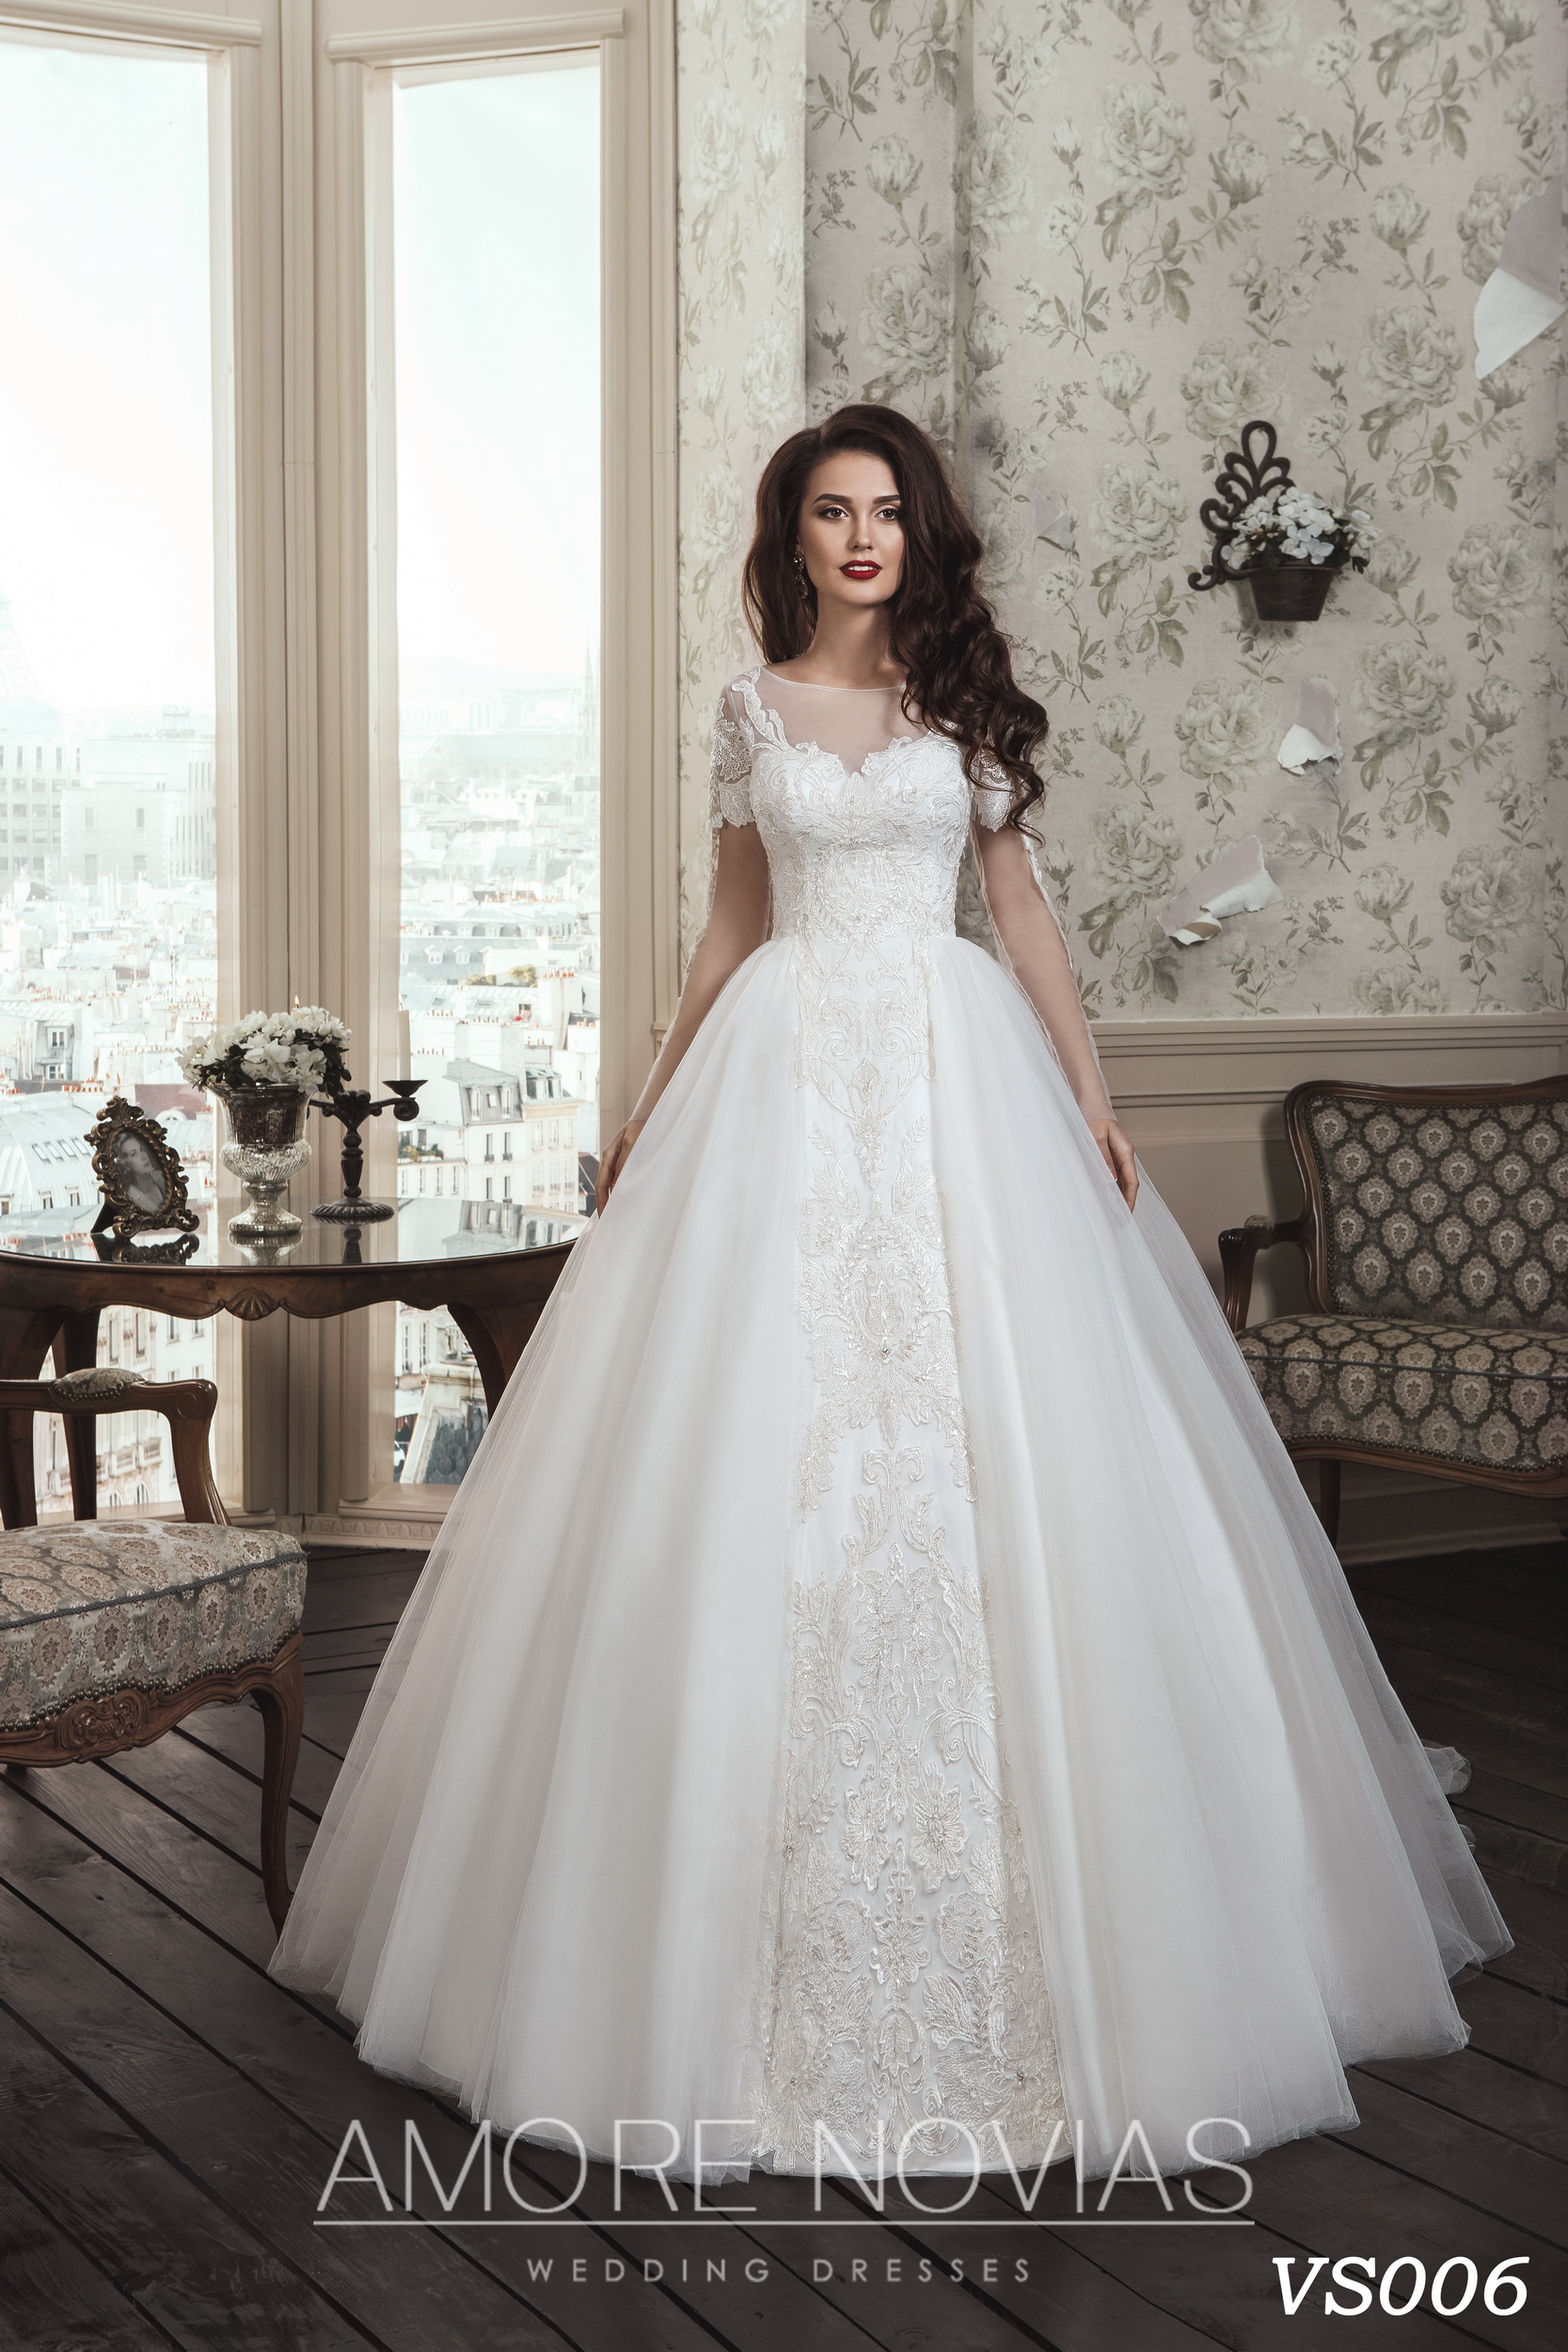 https://amore-novias.com/images/stories/virtuemart/product/vs006.jpg